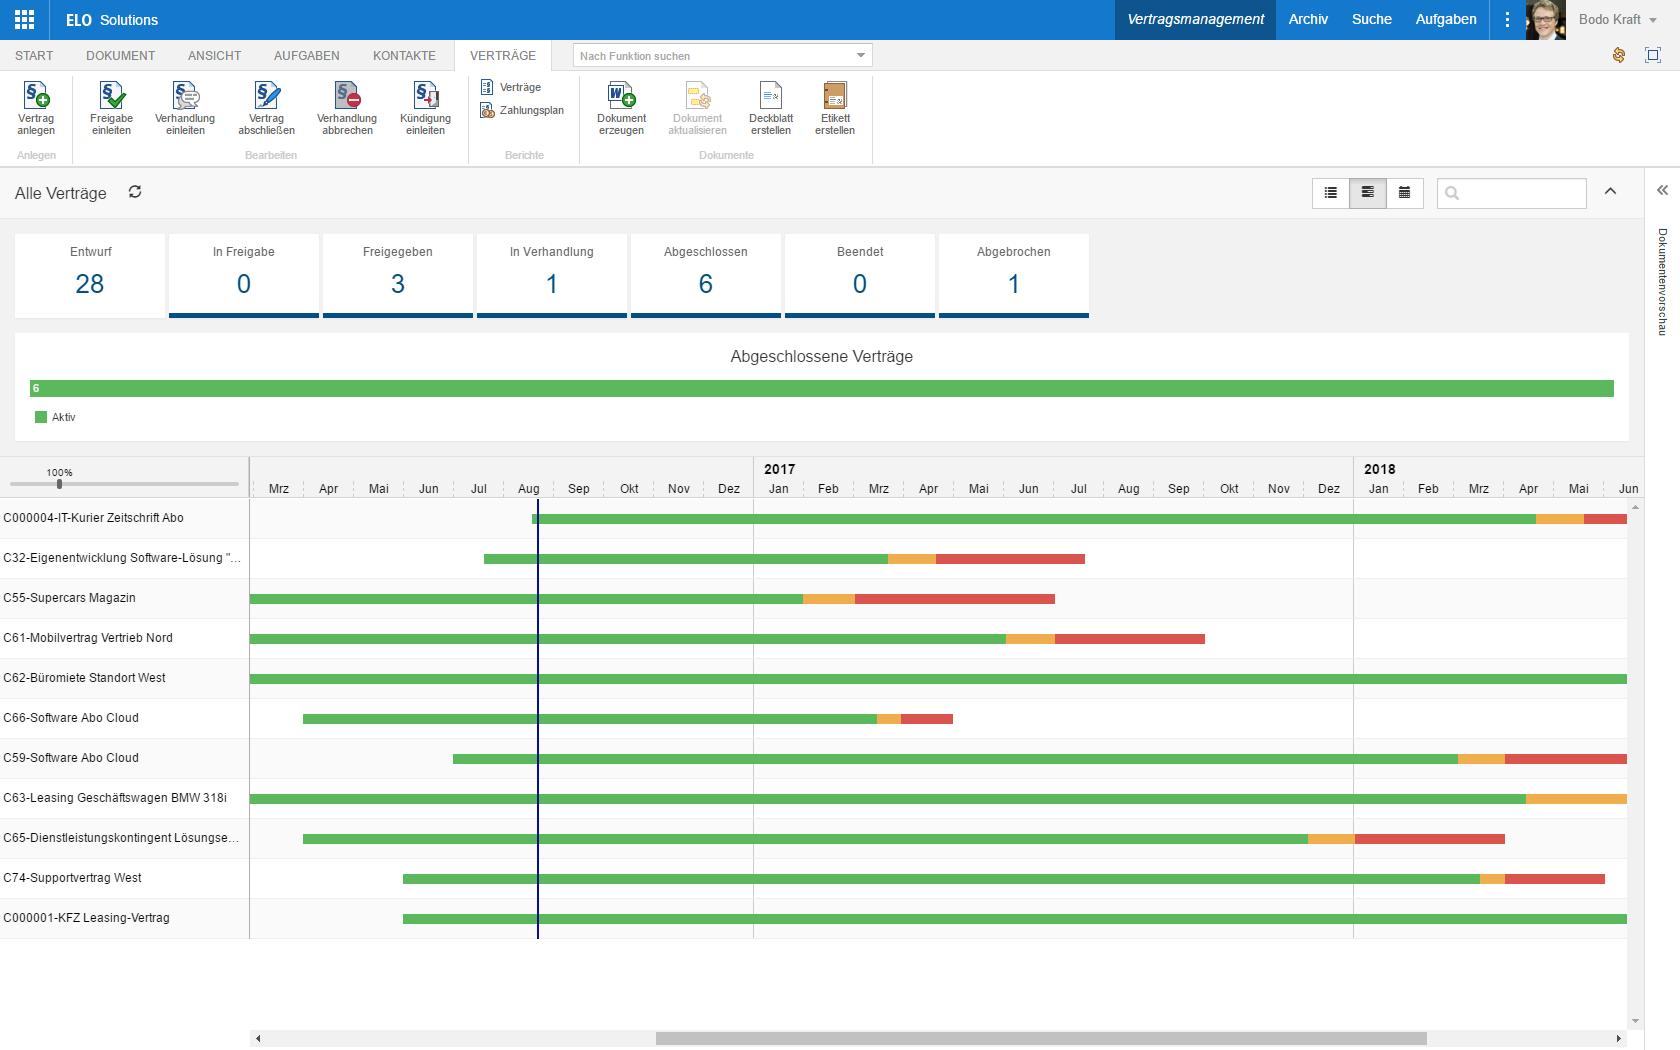 ELO Web Client Contract Verträge Dasboard Zeitleiste